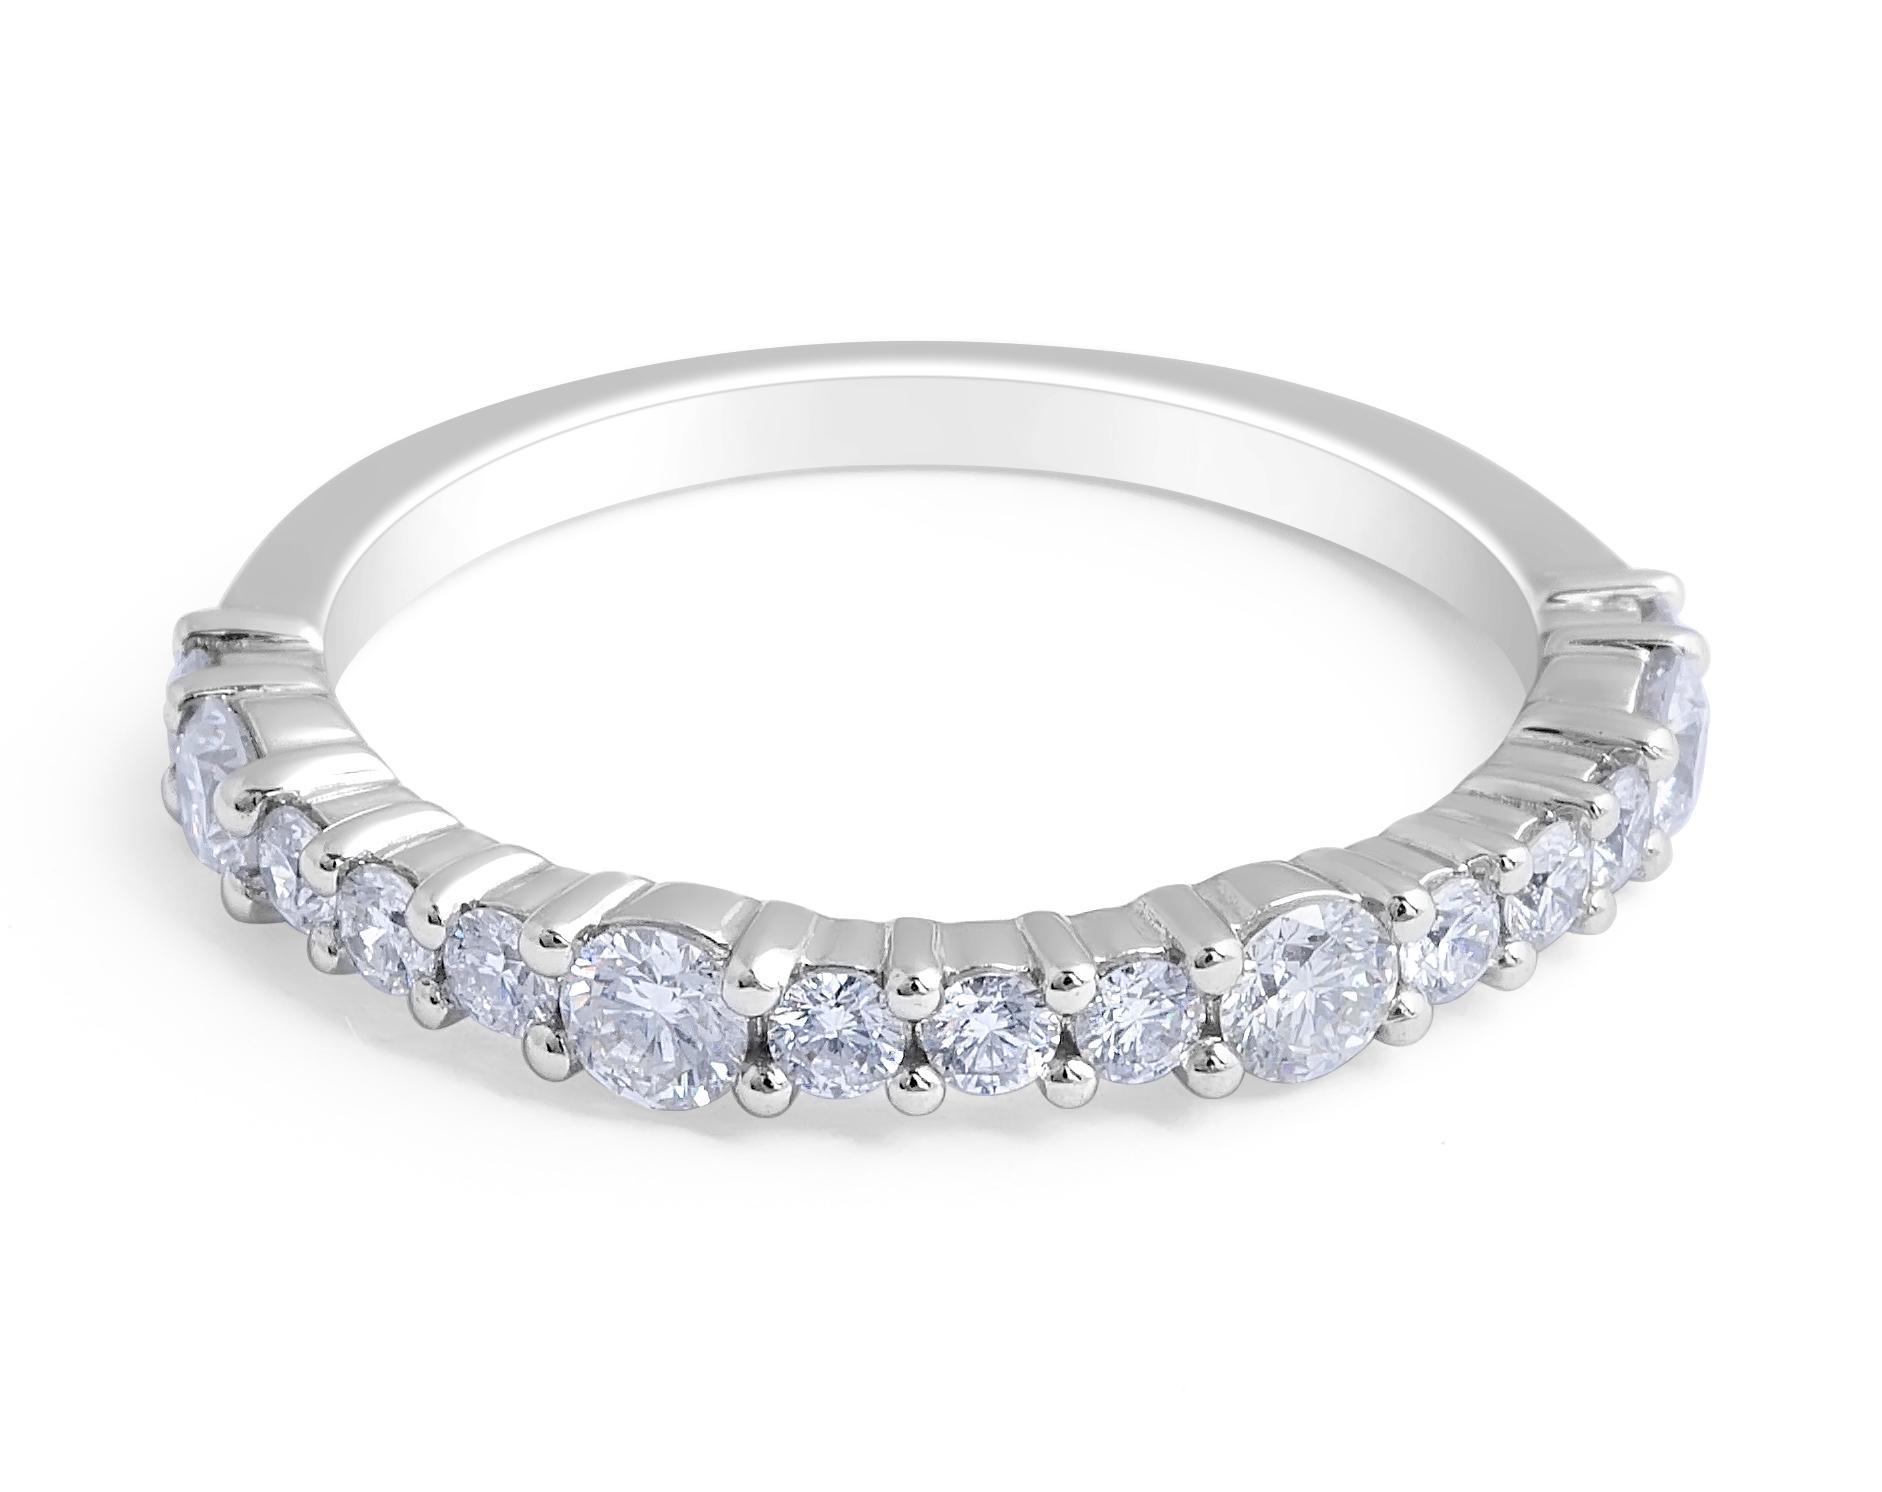 18 Karat White Gold Modern style Diamond Wedding Band - womens wedding bands